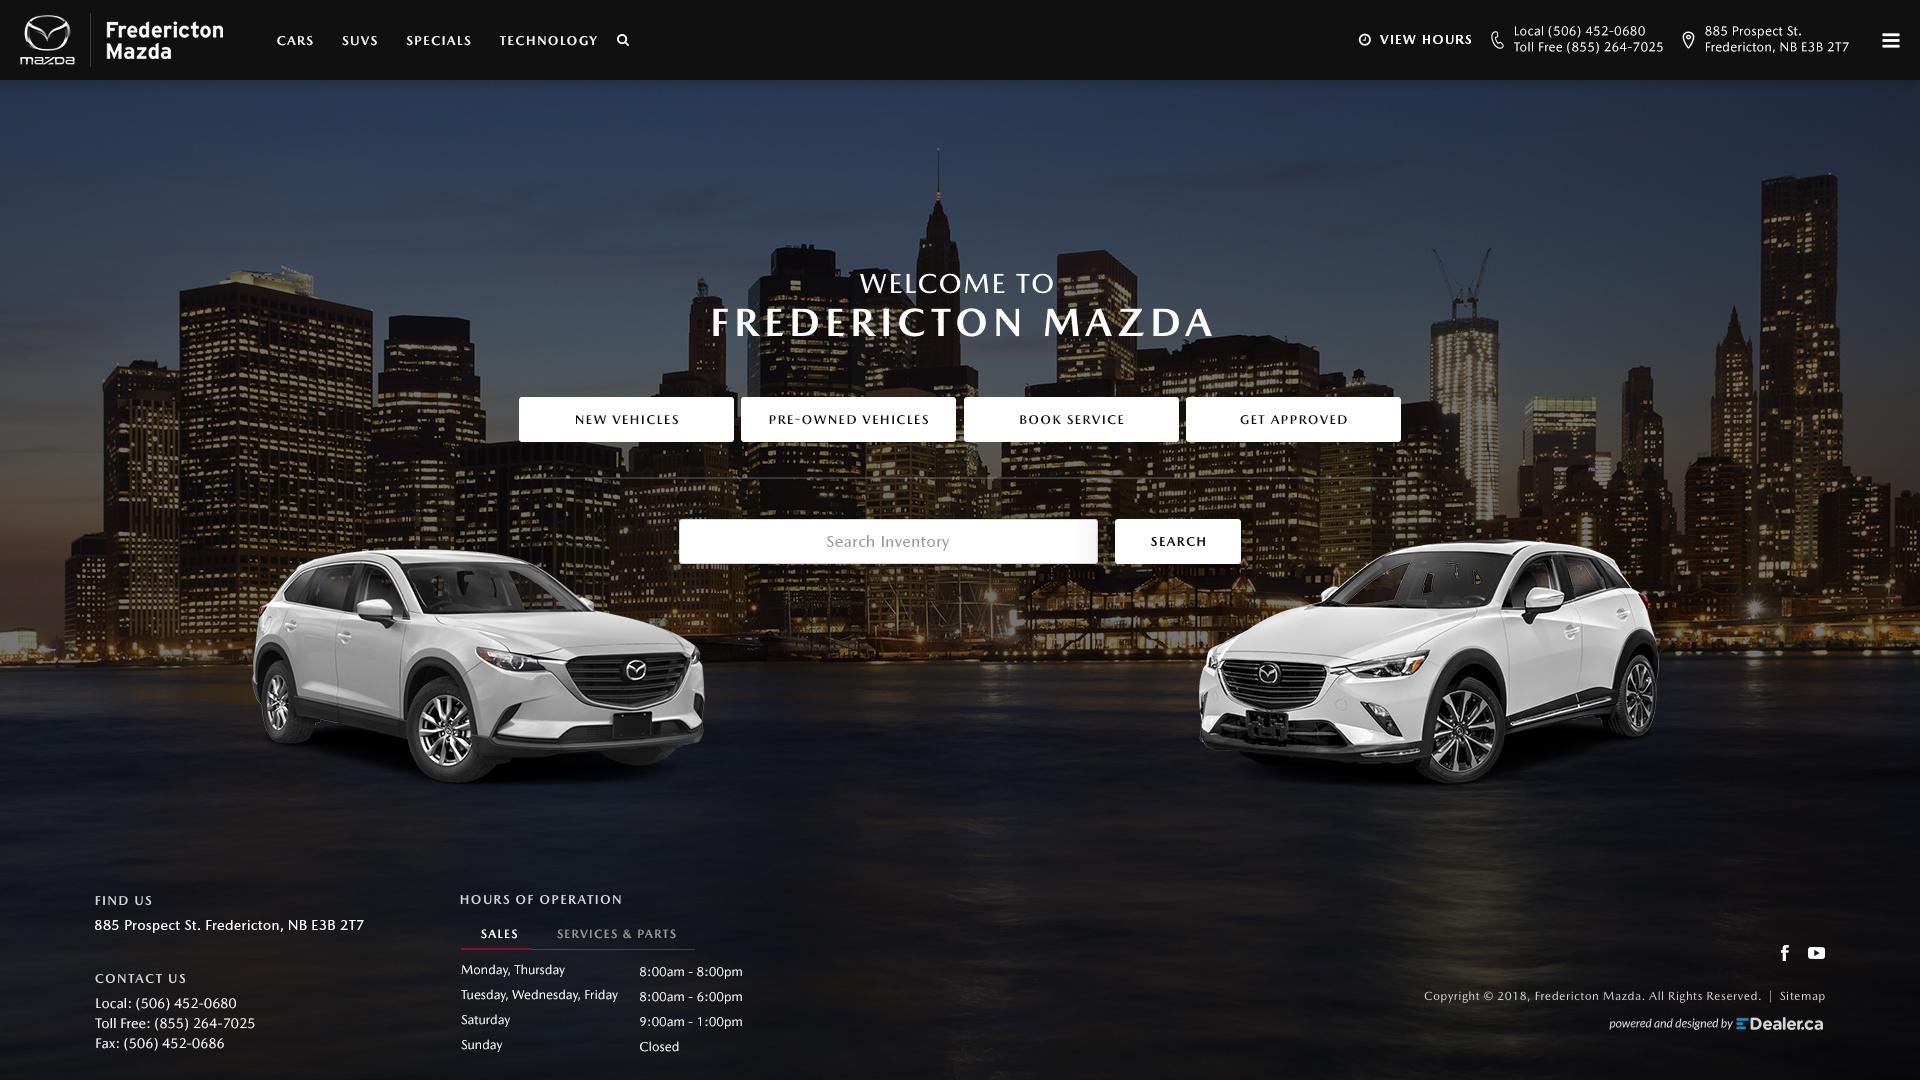 Fredericton Mazda